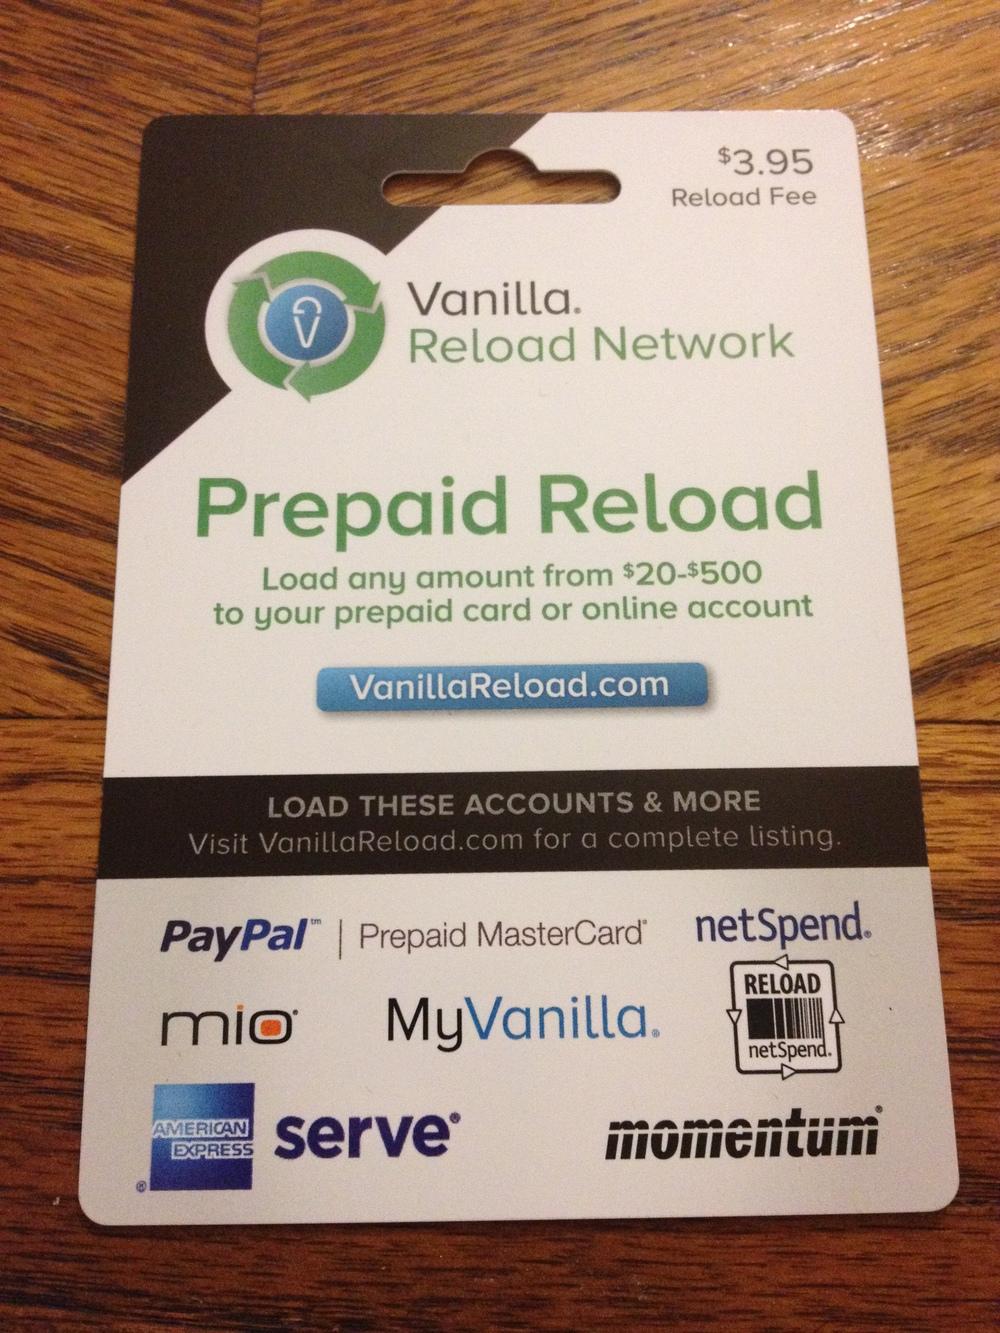 Netspend Premier Prepaid Debit Mastercard